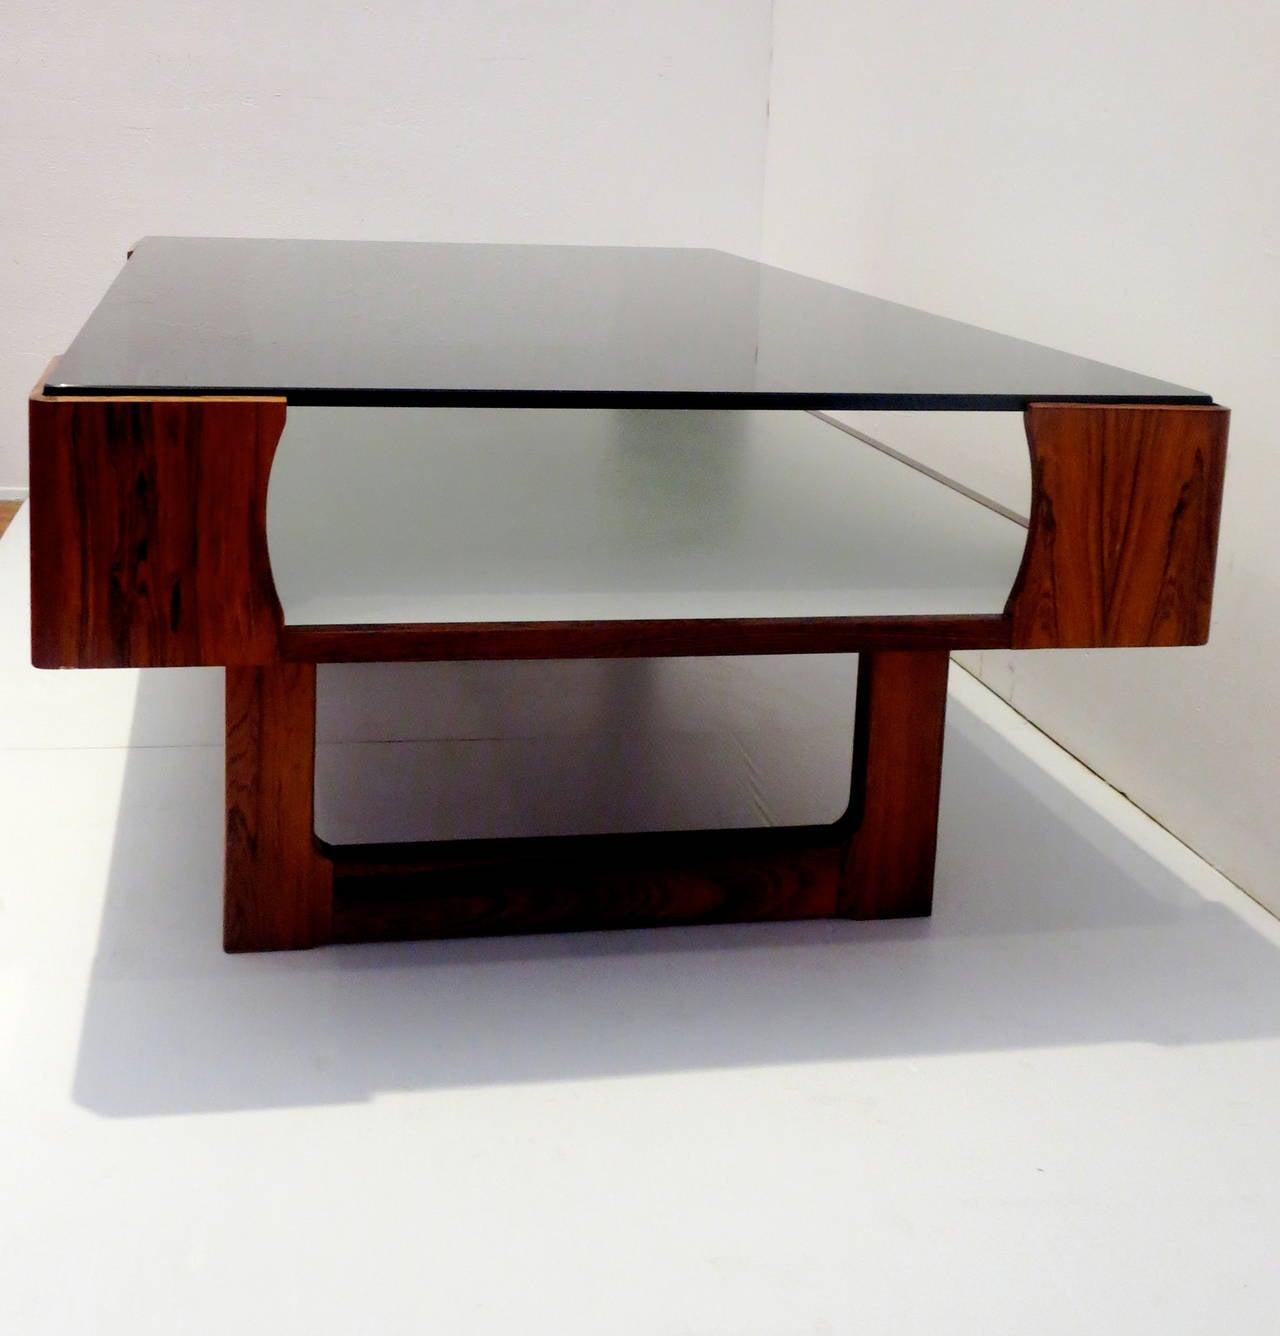 1970s Rosewood Coffee Table Display Case By Torbjorn Afdal